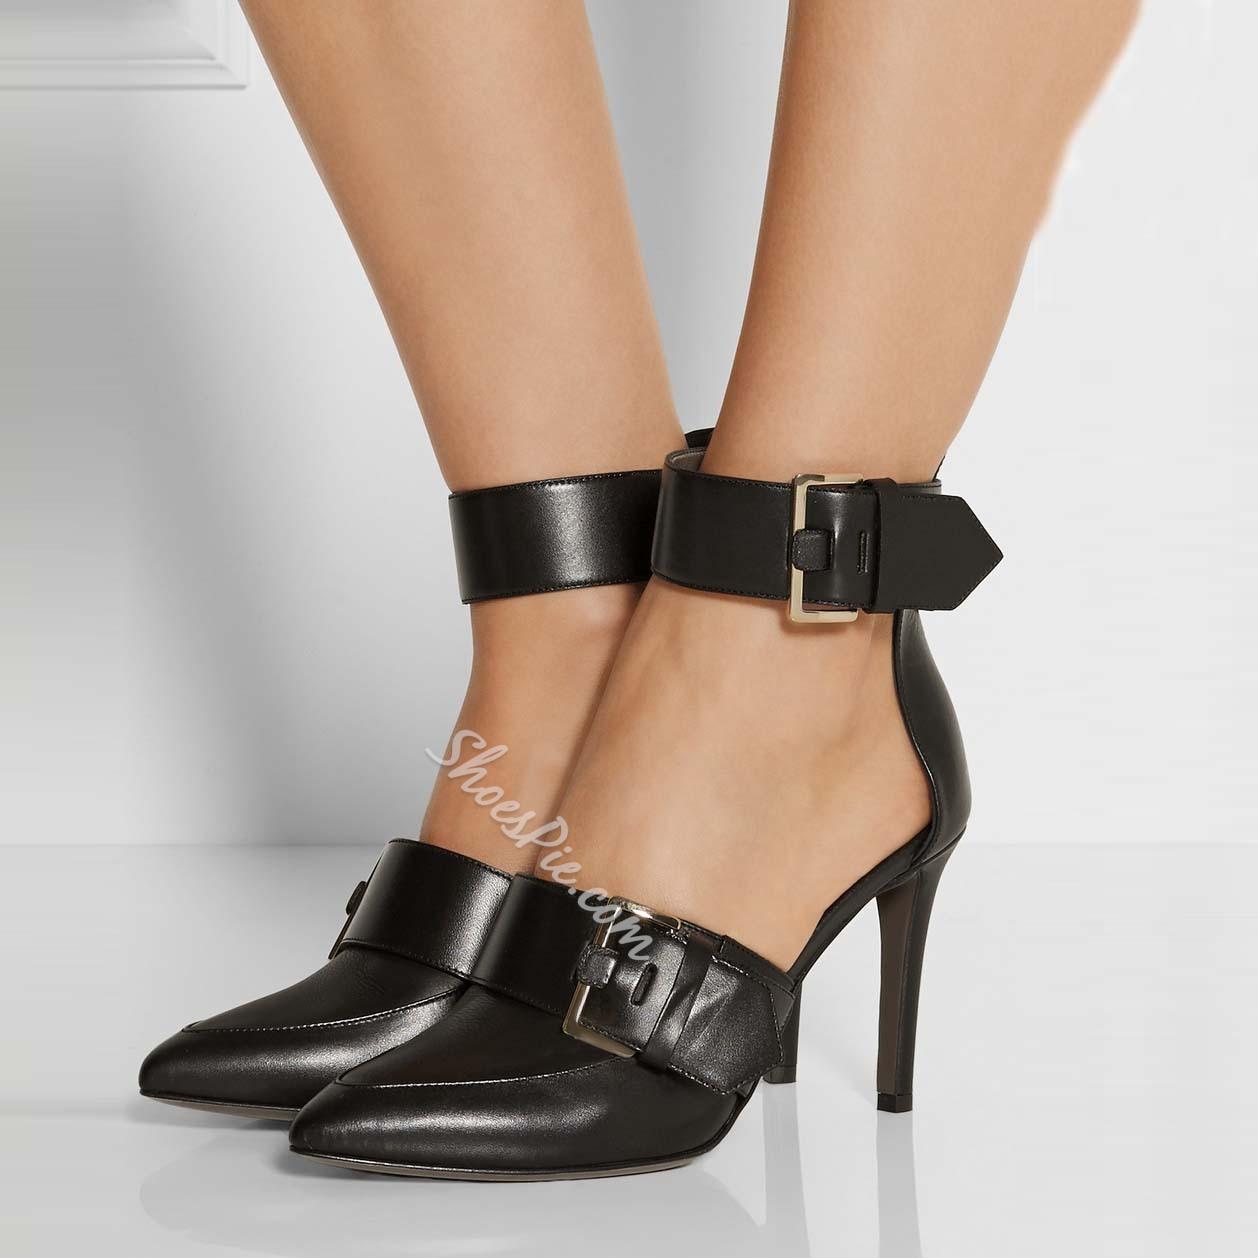 Shoespie Black Buckles Ankle Wrap Stiletto Heels